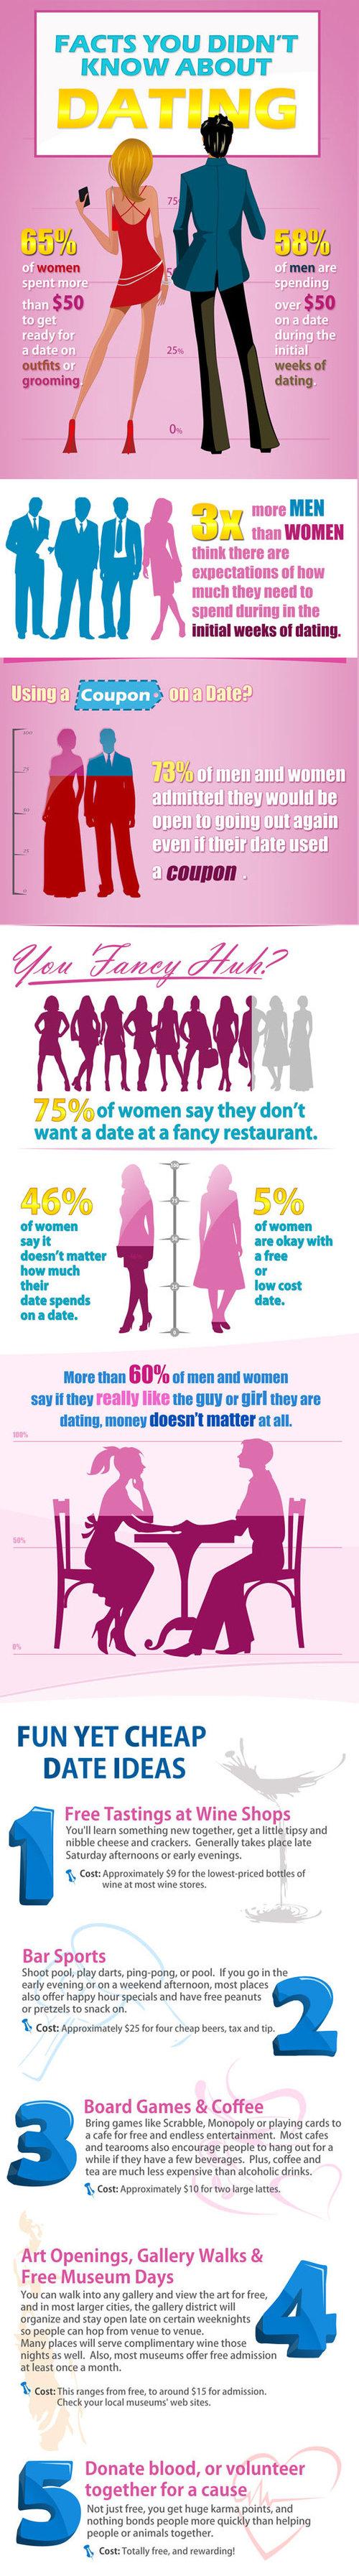 rige dating fattige